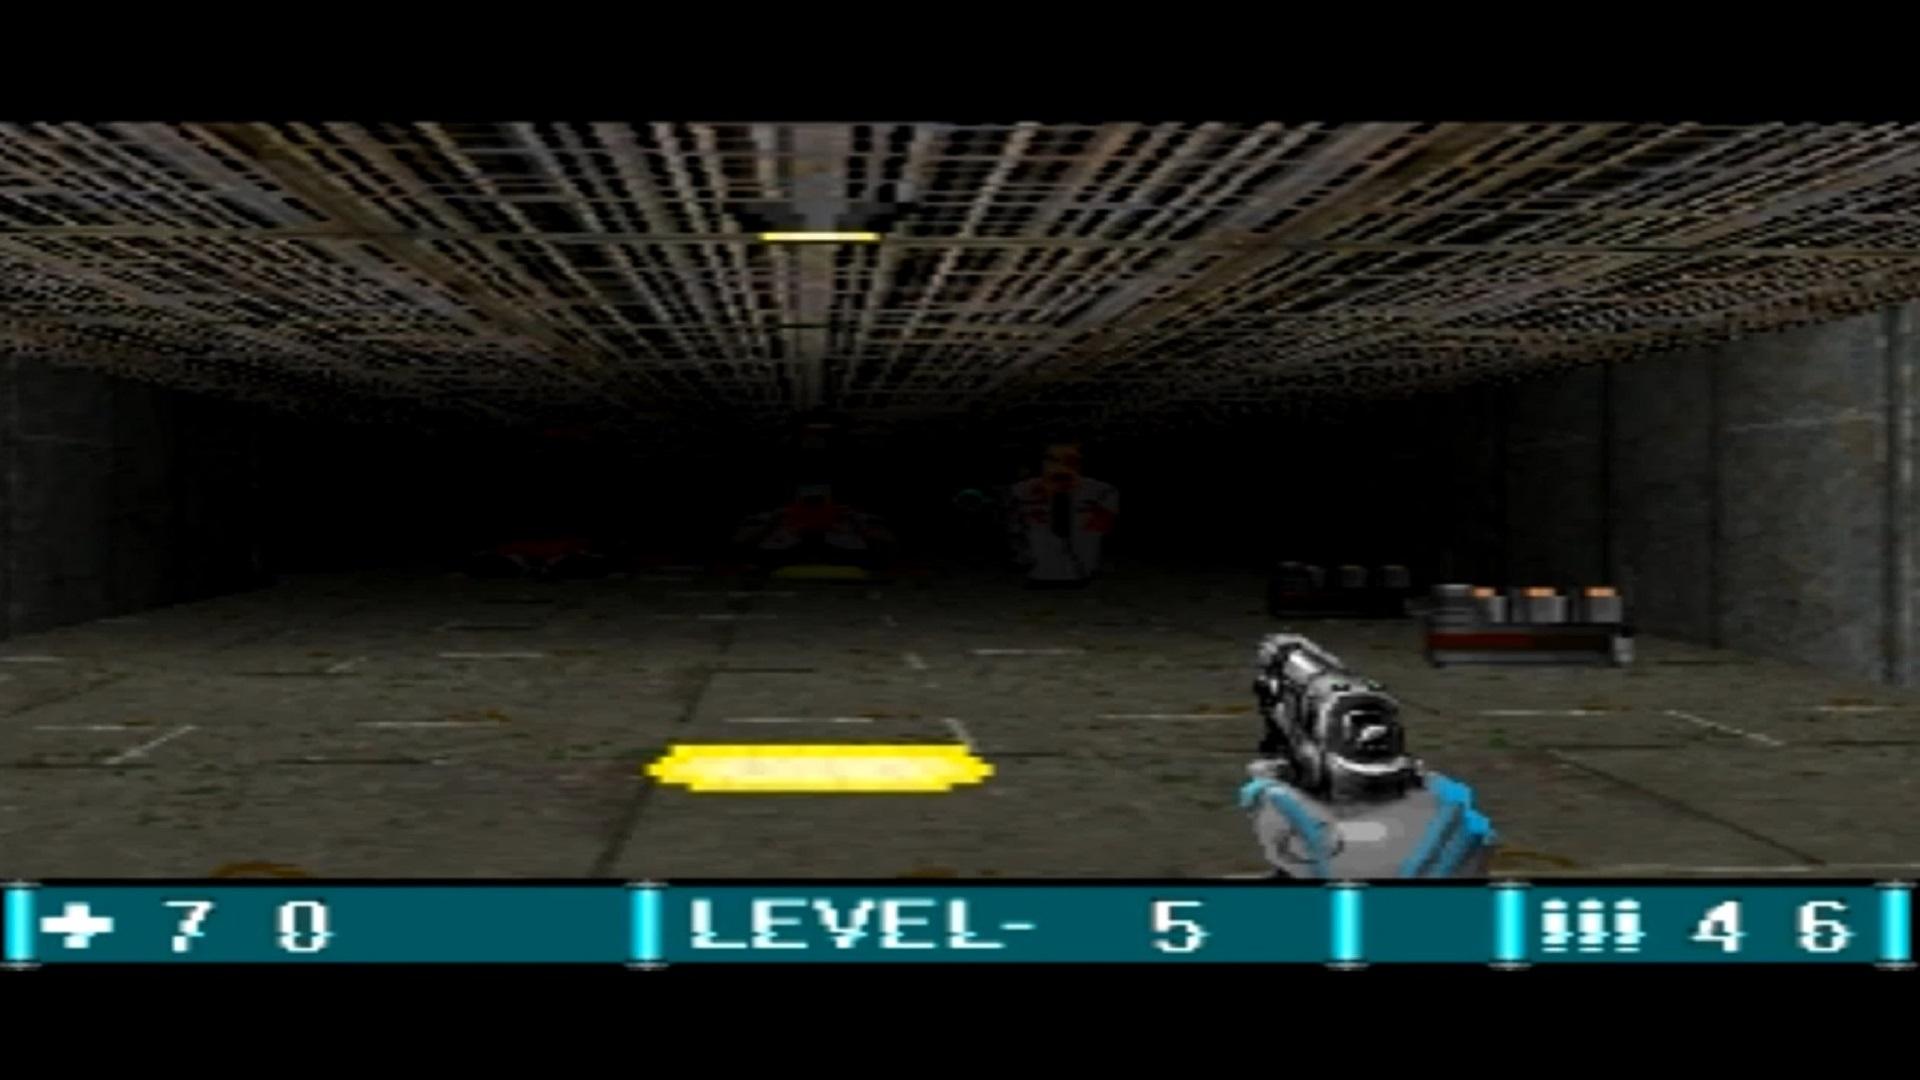 Skyfall screenshot